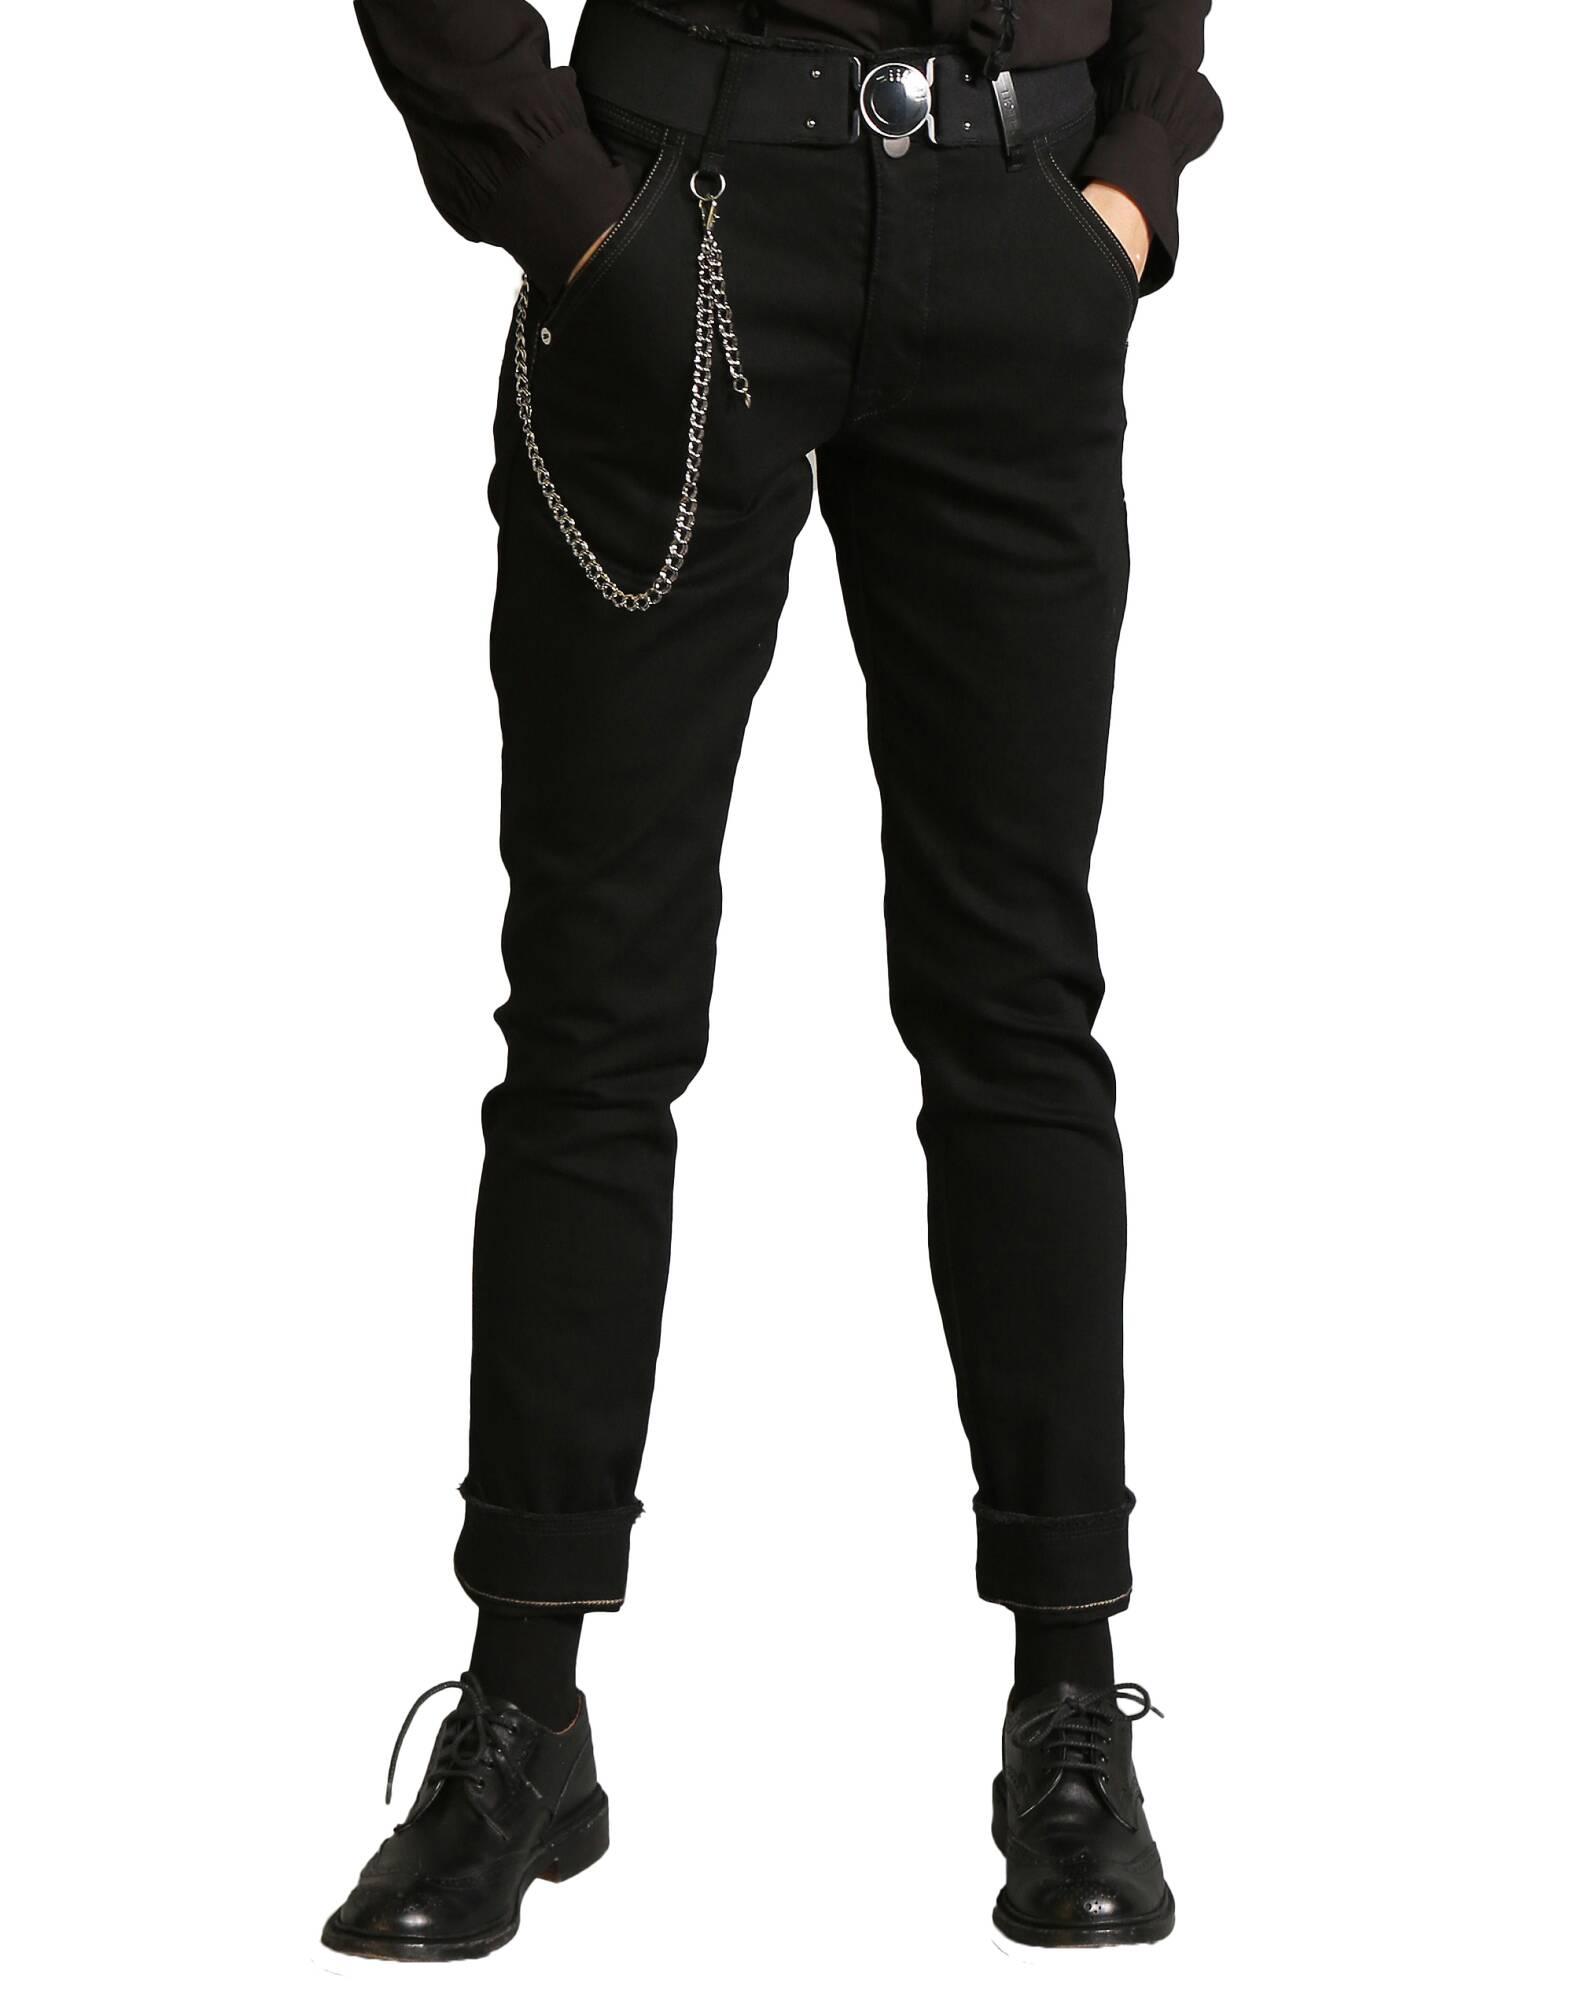 Jeans VERVE 199 | HIGH